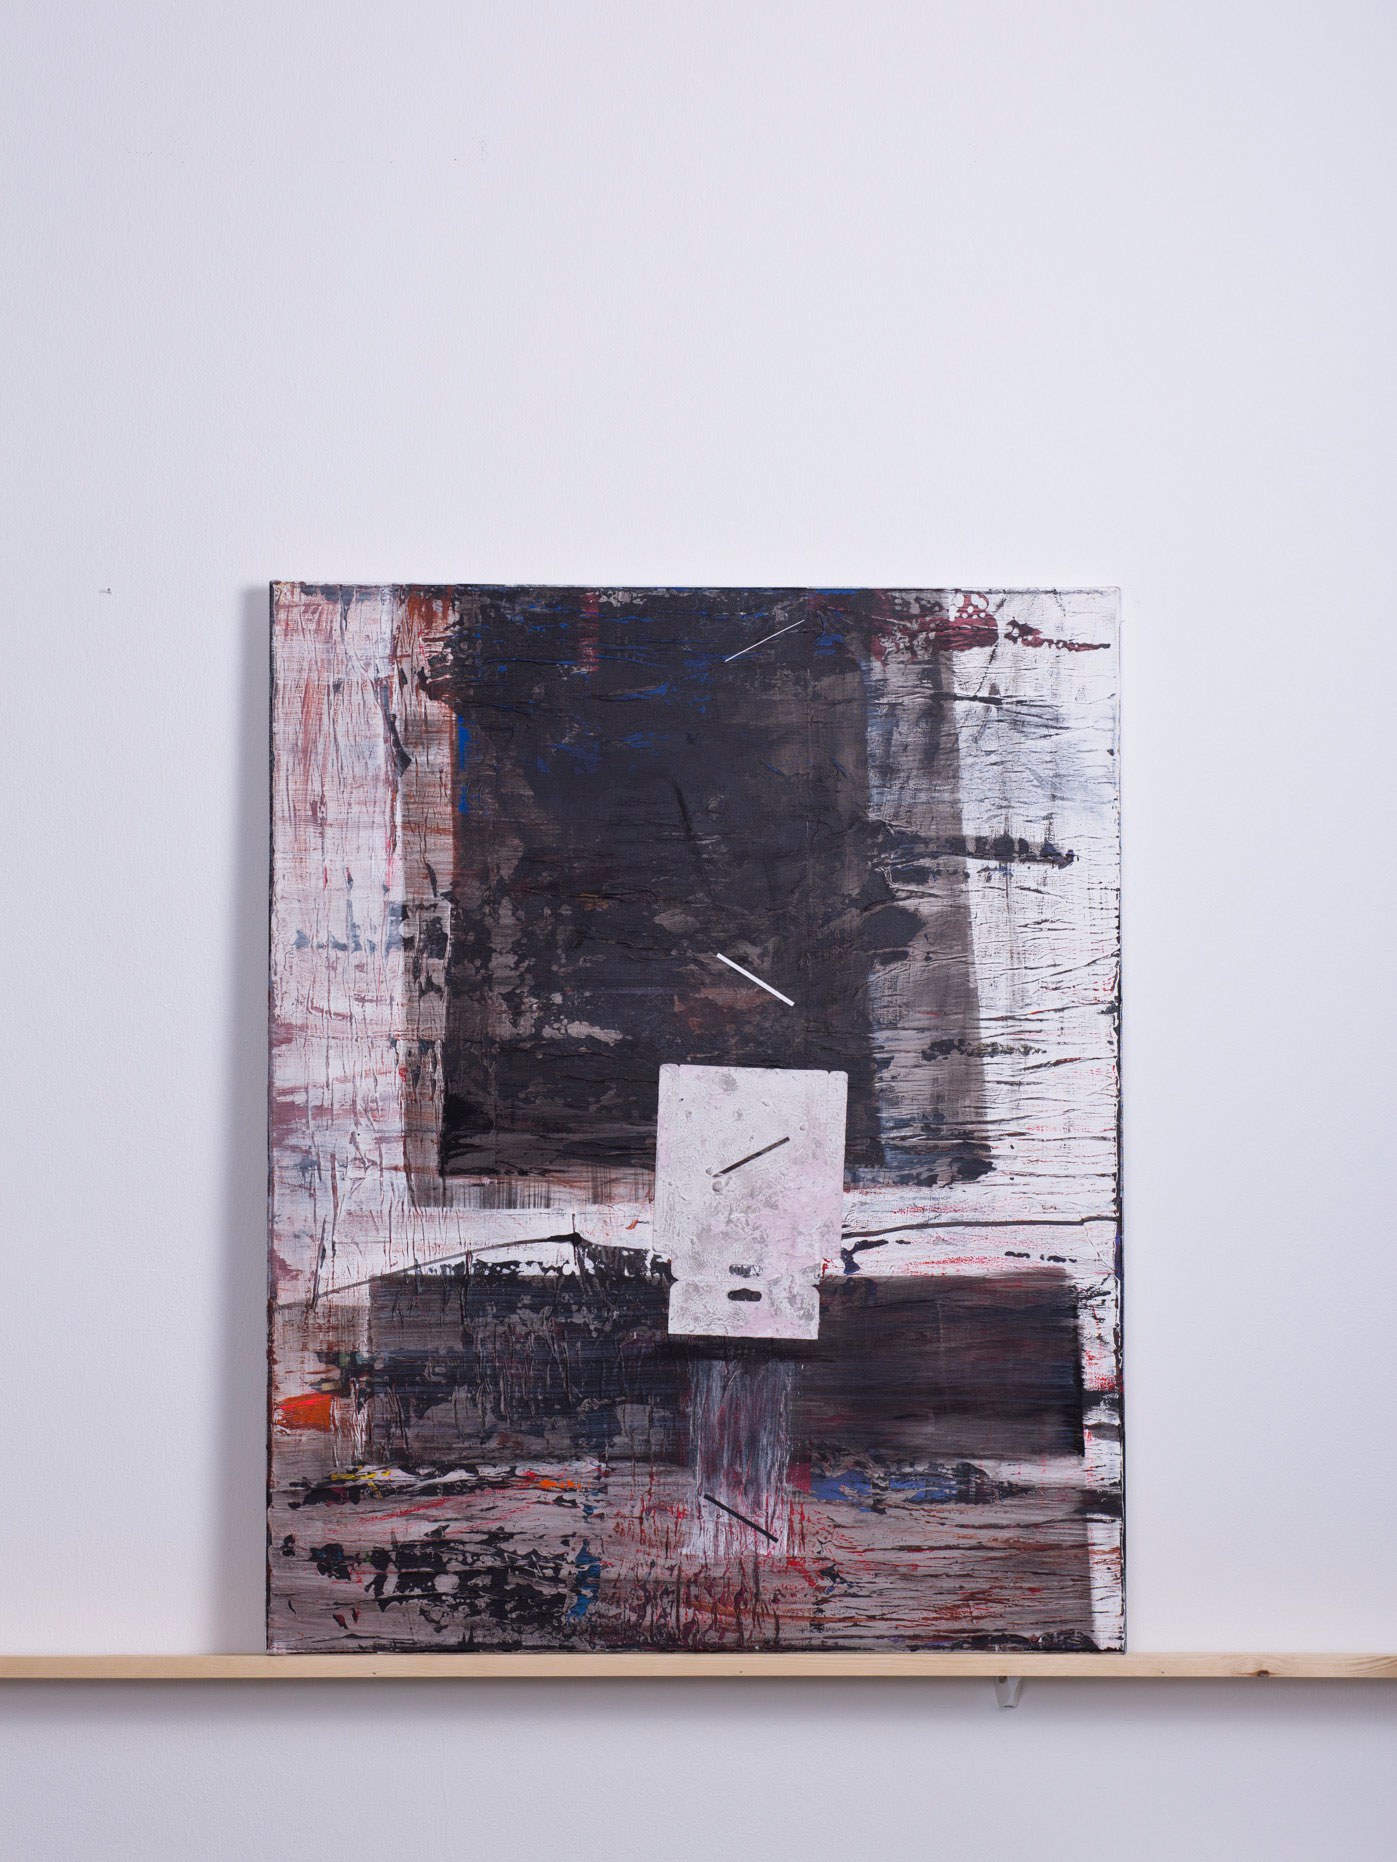 Mikado, 2012 - 80x100 cm,<br> Acryl und Papier auf Leinwand